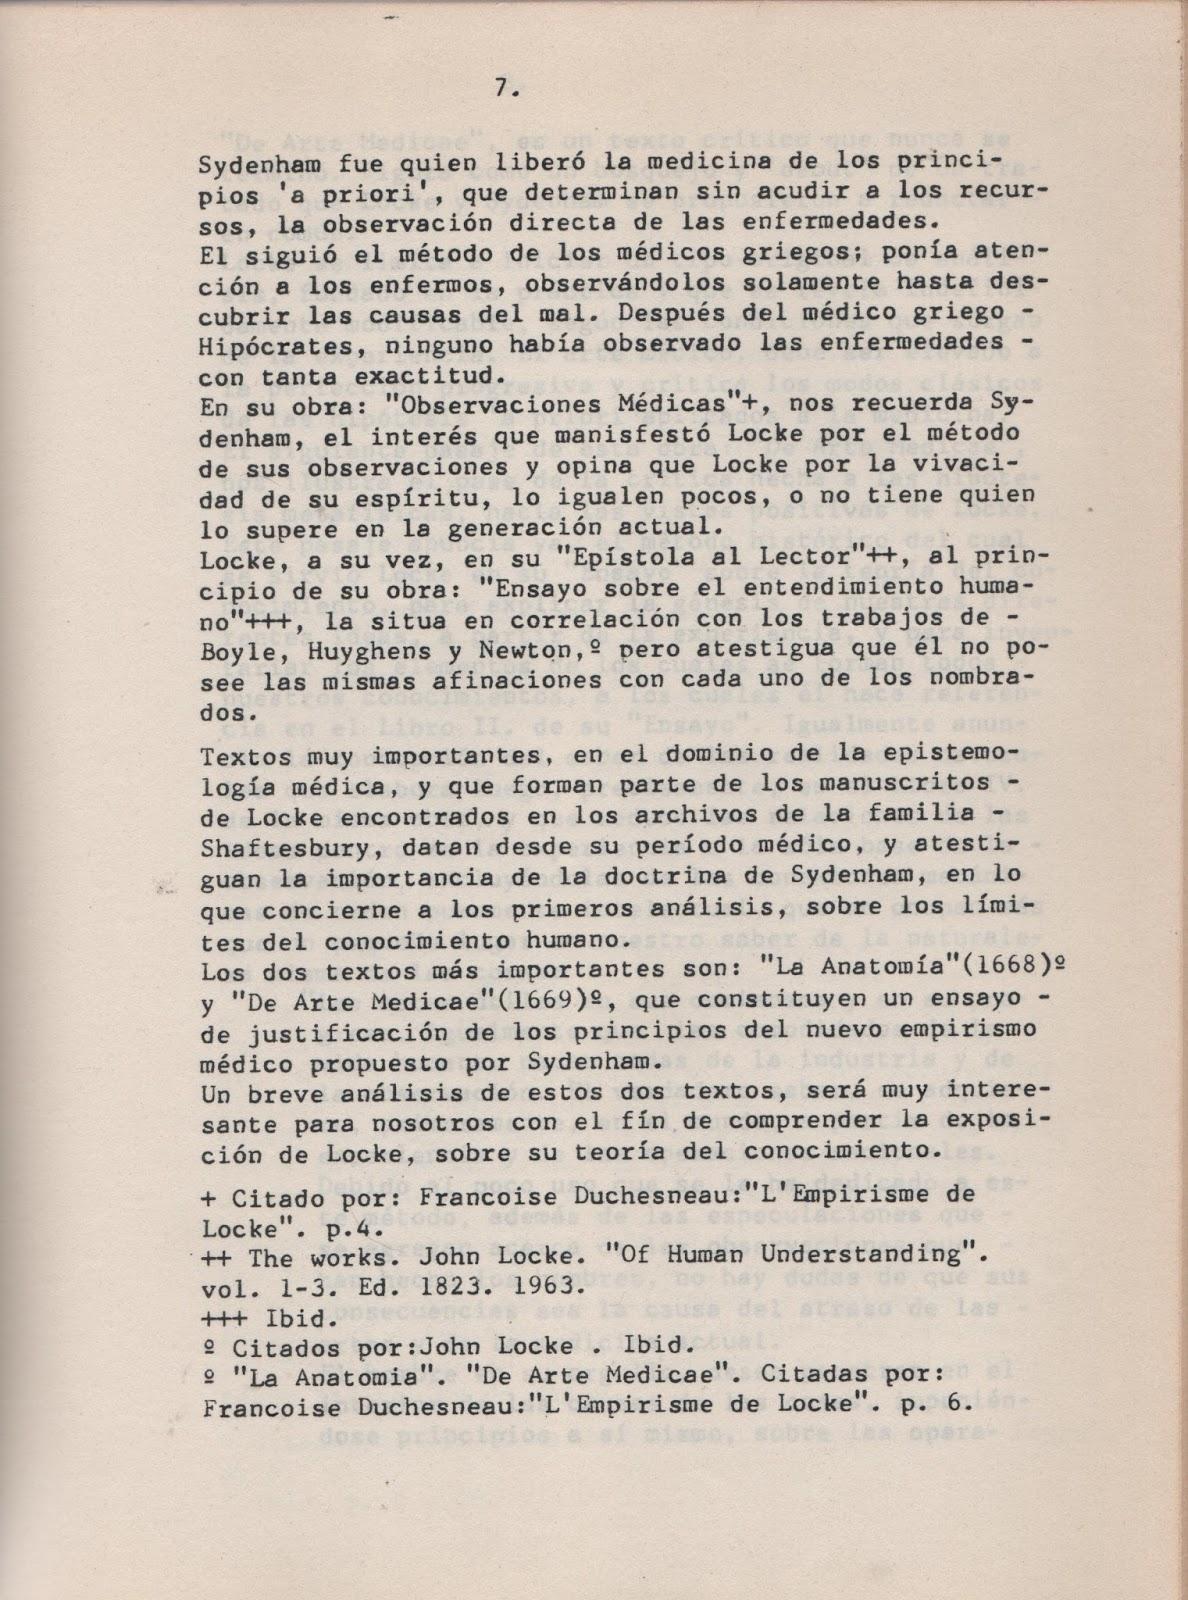 Victor M. Gruber F.: DE FIGARELLI ANTONIA--JOHN LOCKE--TESIS DE ...